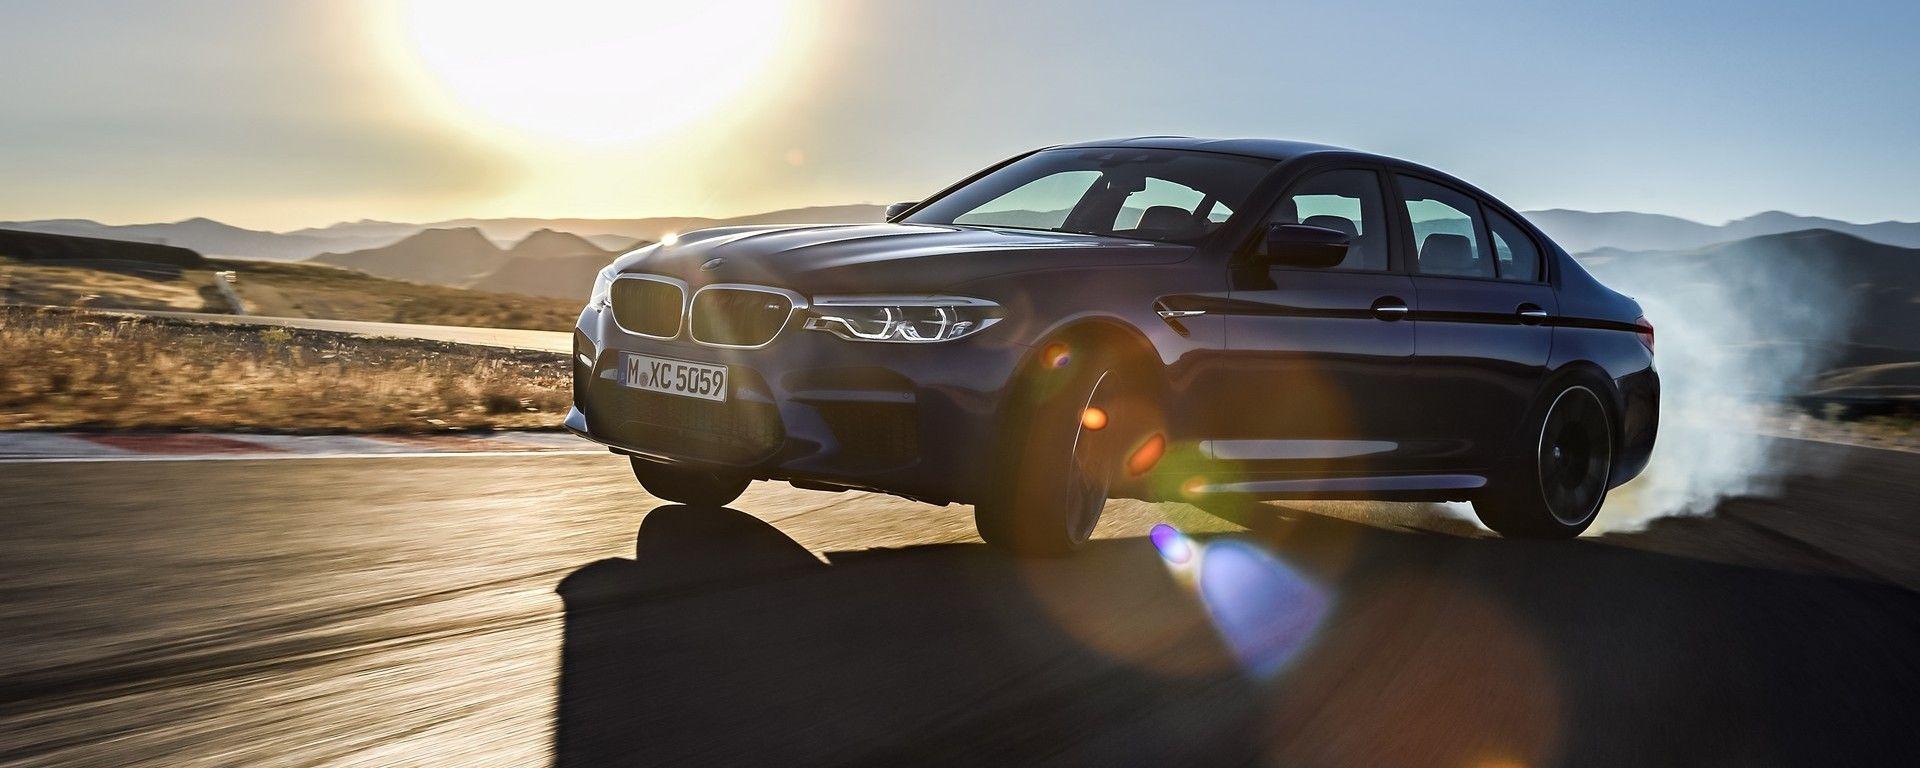 BMW M5 2017: la prova in pista a Vallelunga